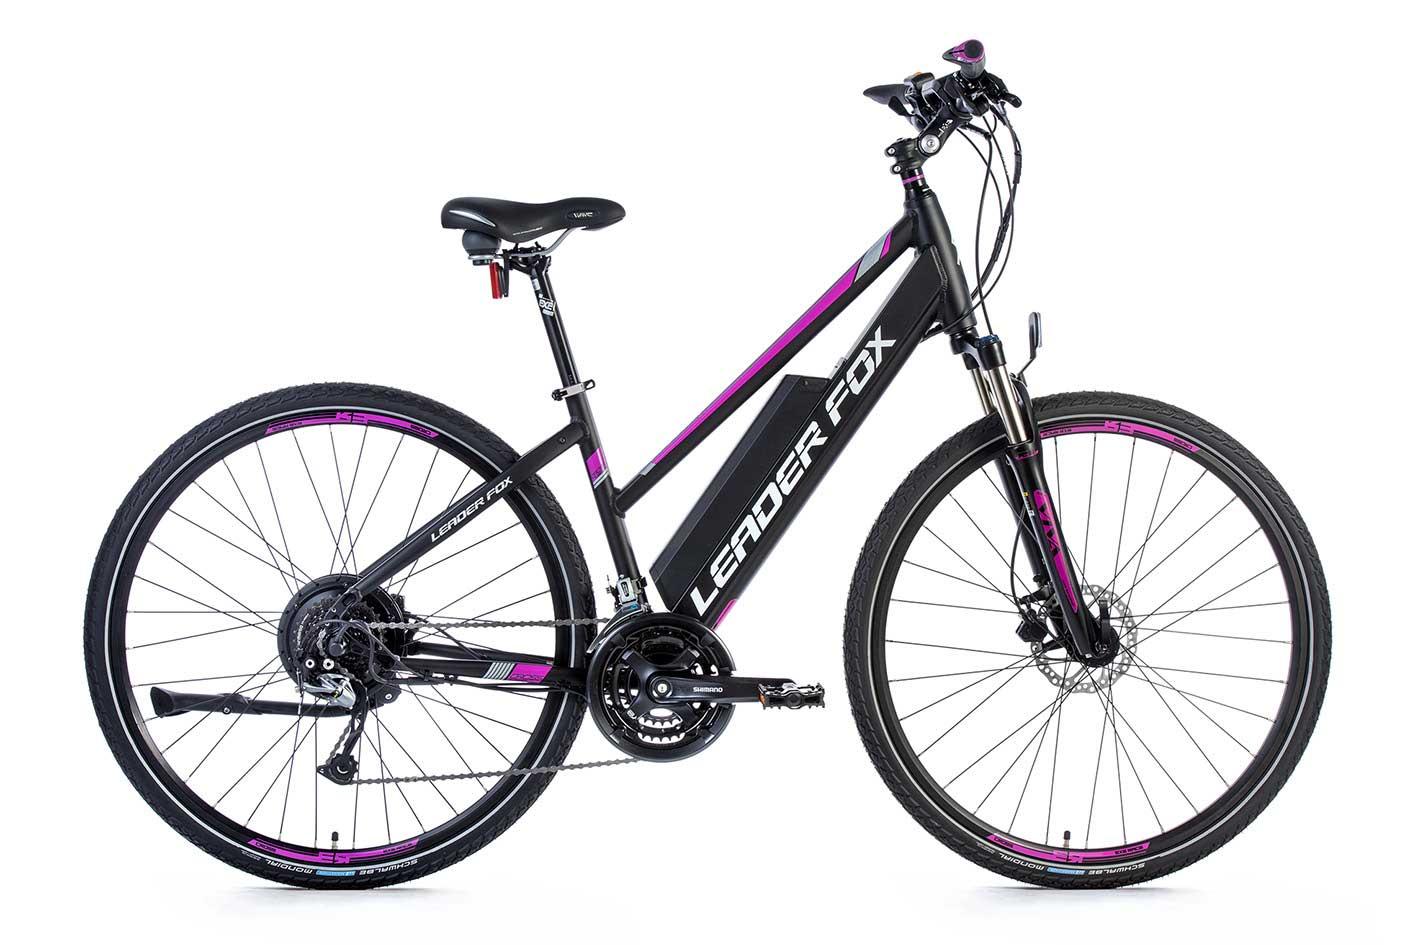 Bicicleta Electrica Cross Leader Fox BARNET Lady 2018